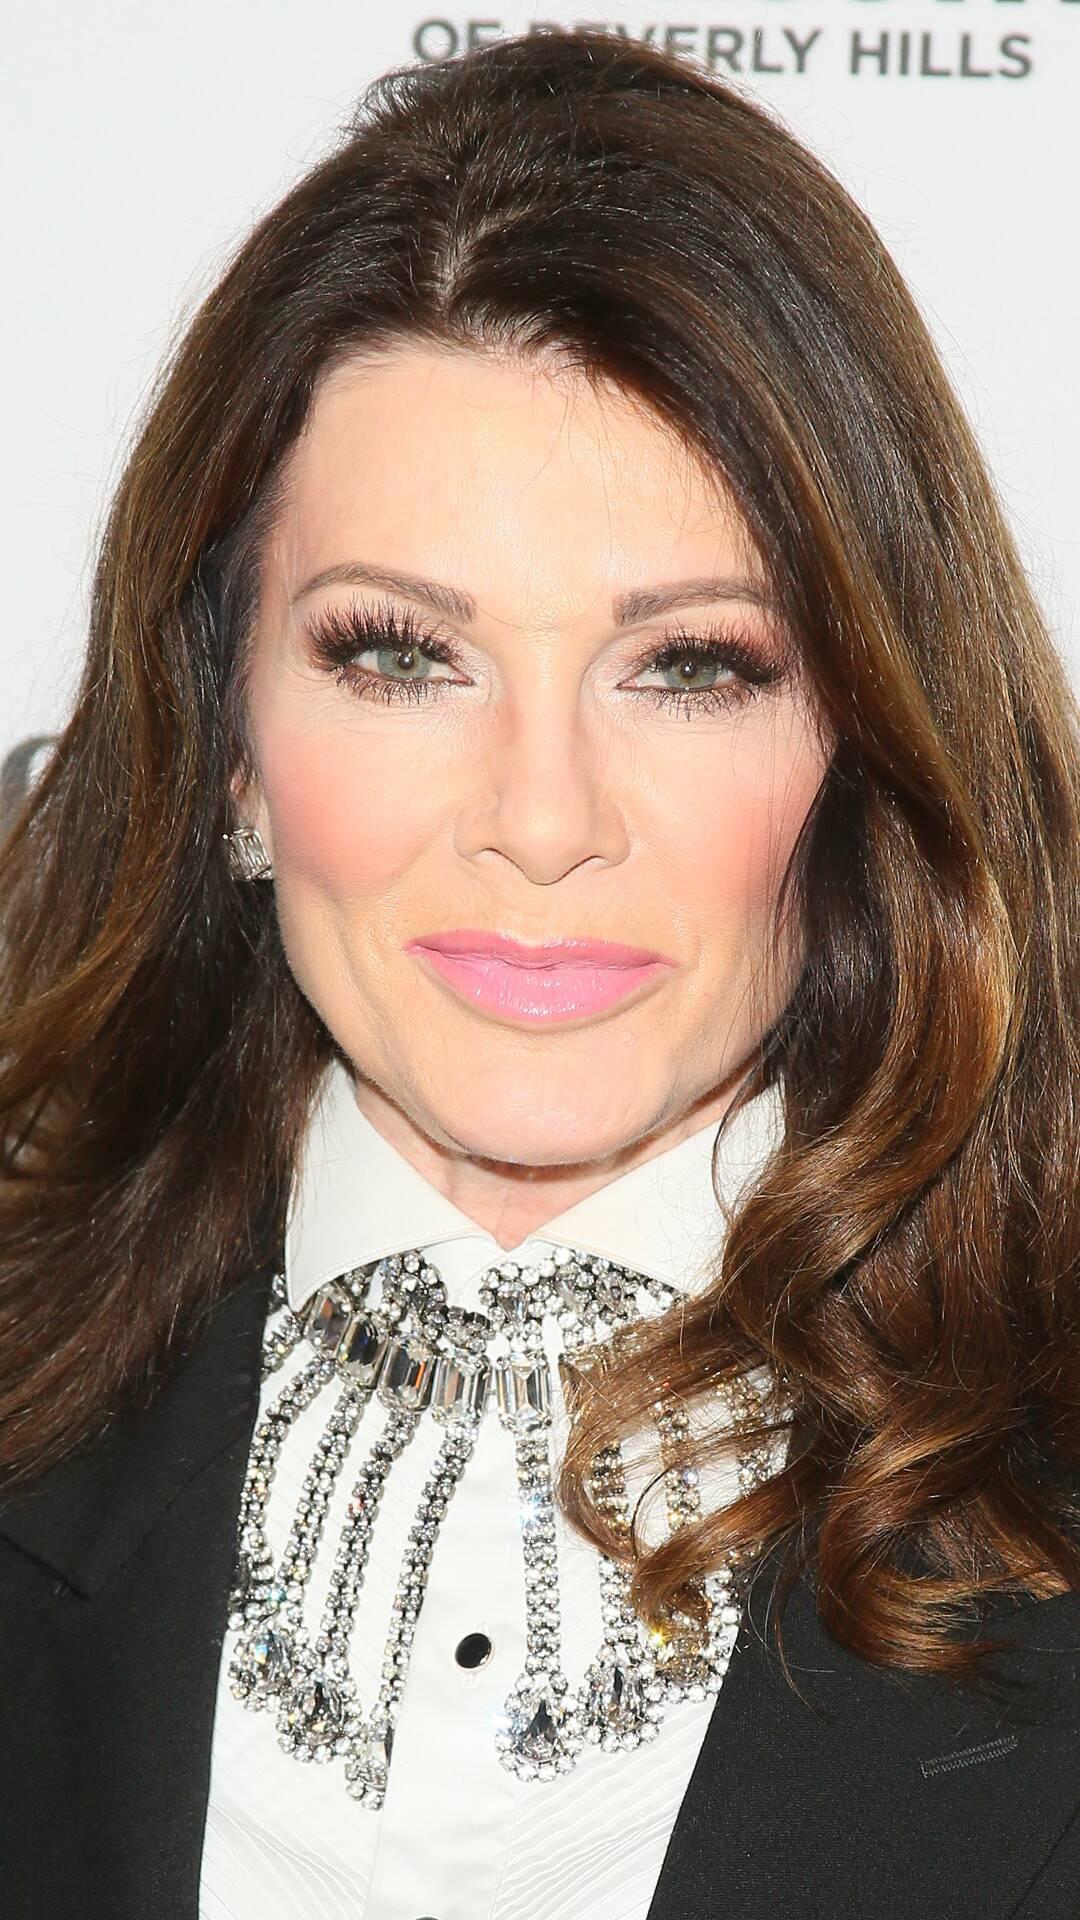 Lisa Vanderpump Breaks Her Silence After Stassi Schroeder and Kristen Doute's Firings